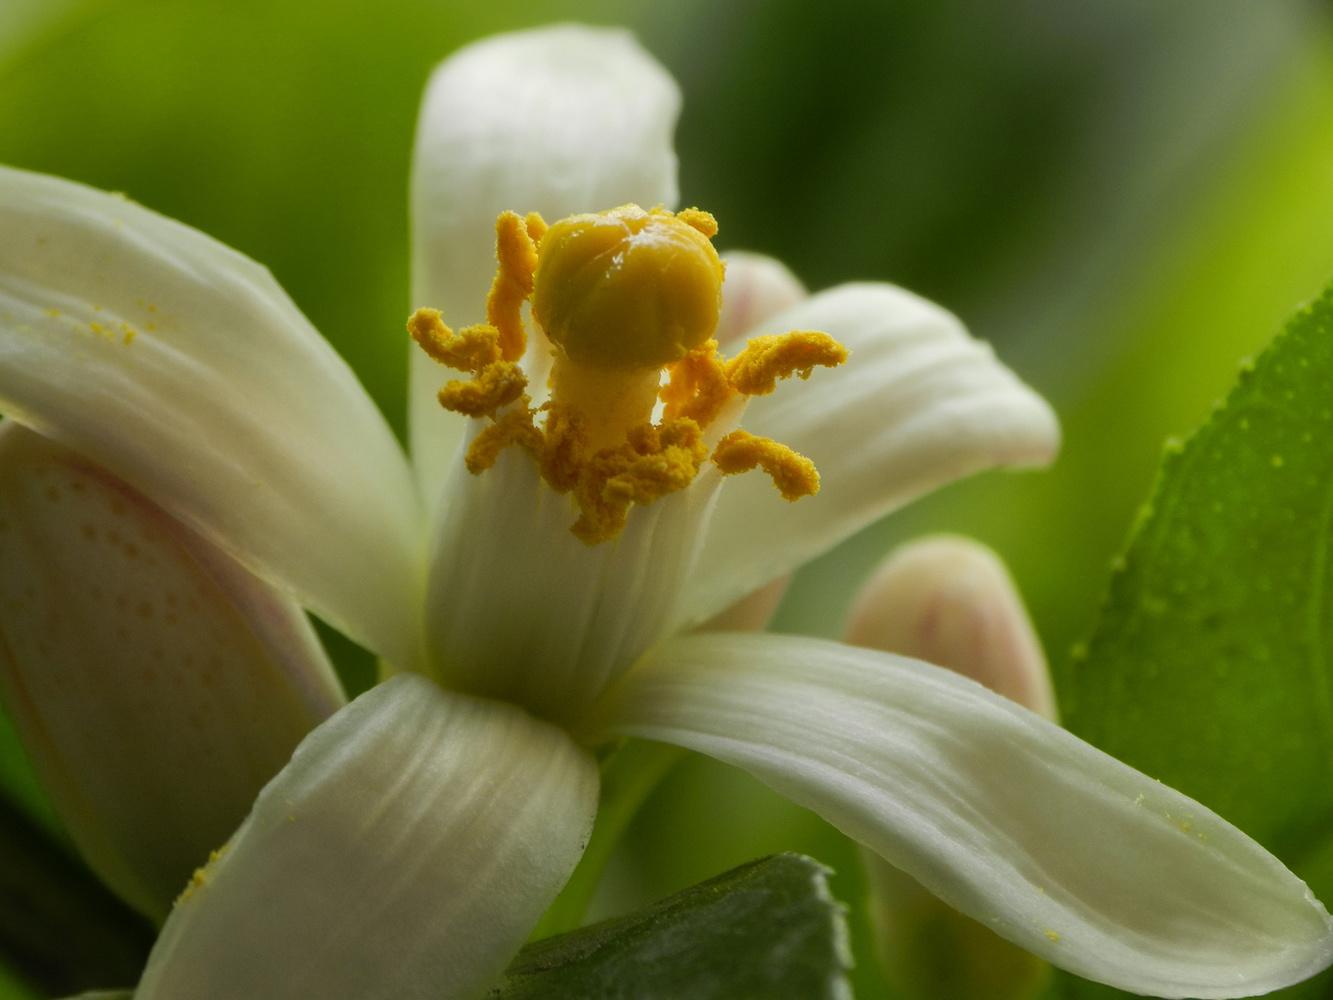 Lemon Blossom by hammad ahmed